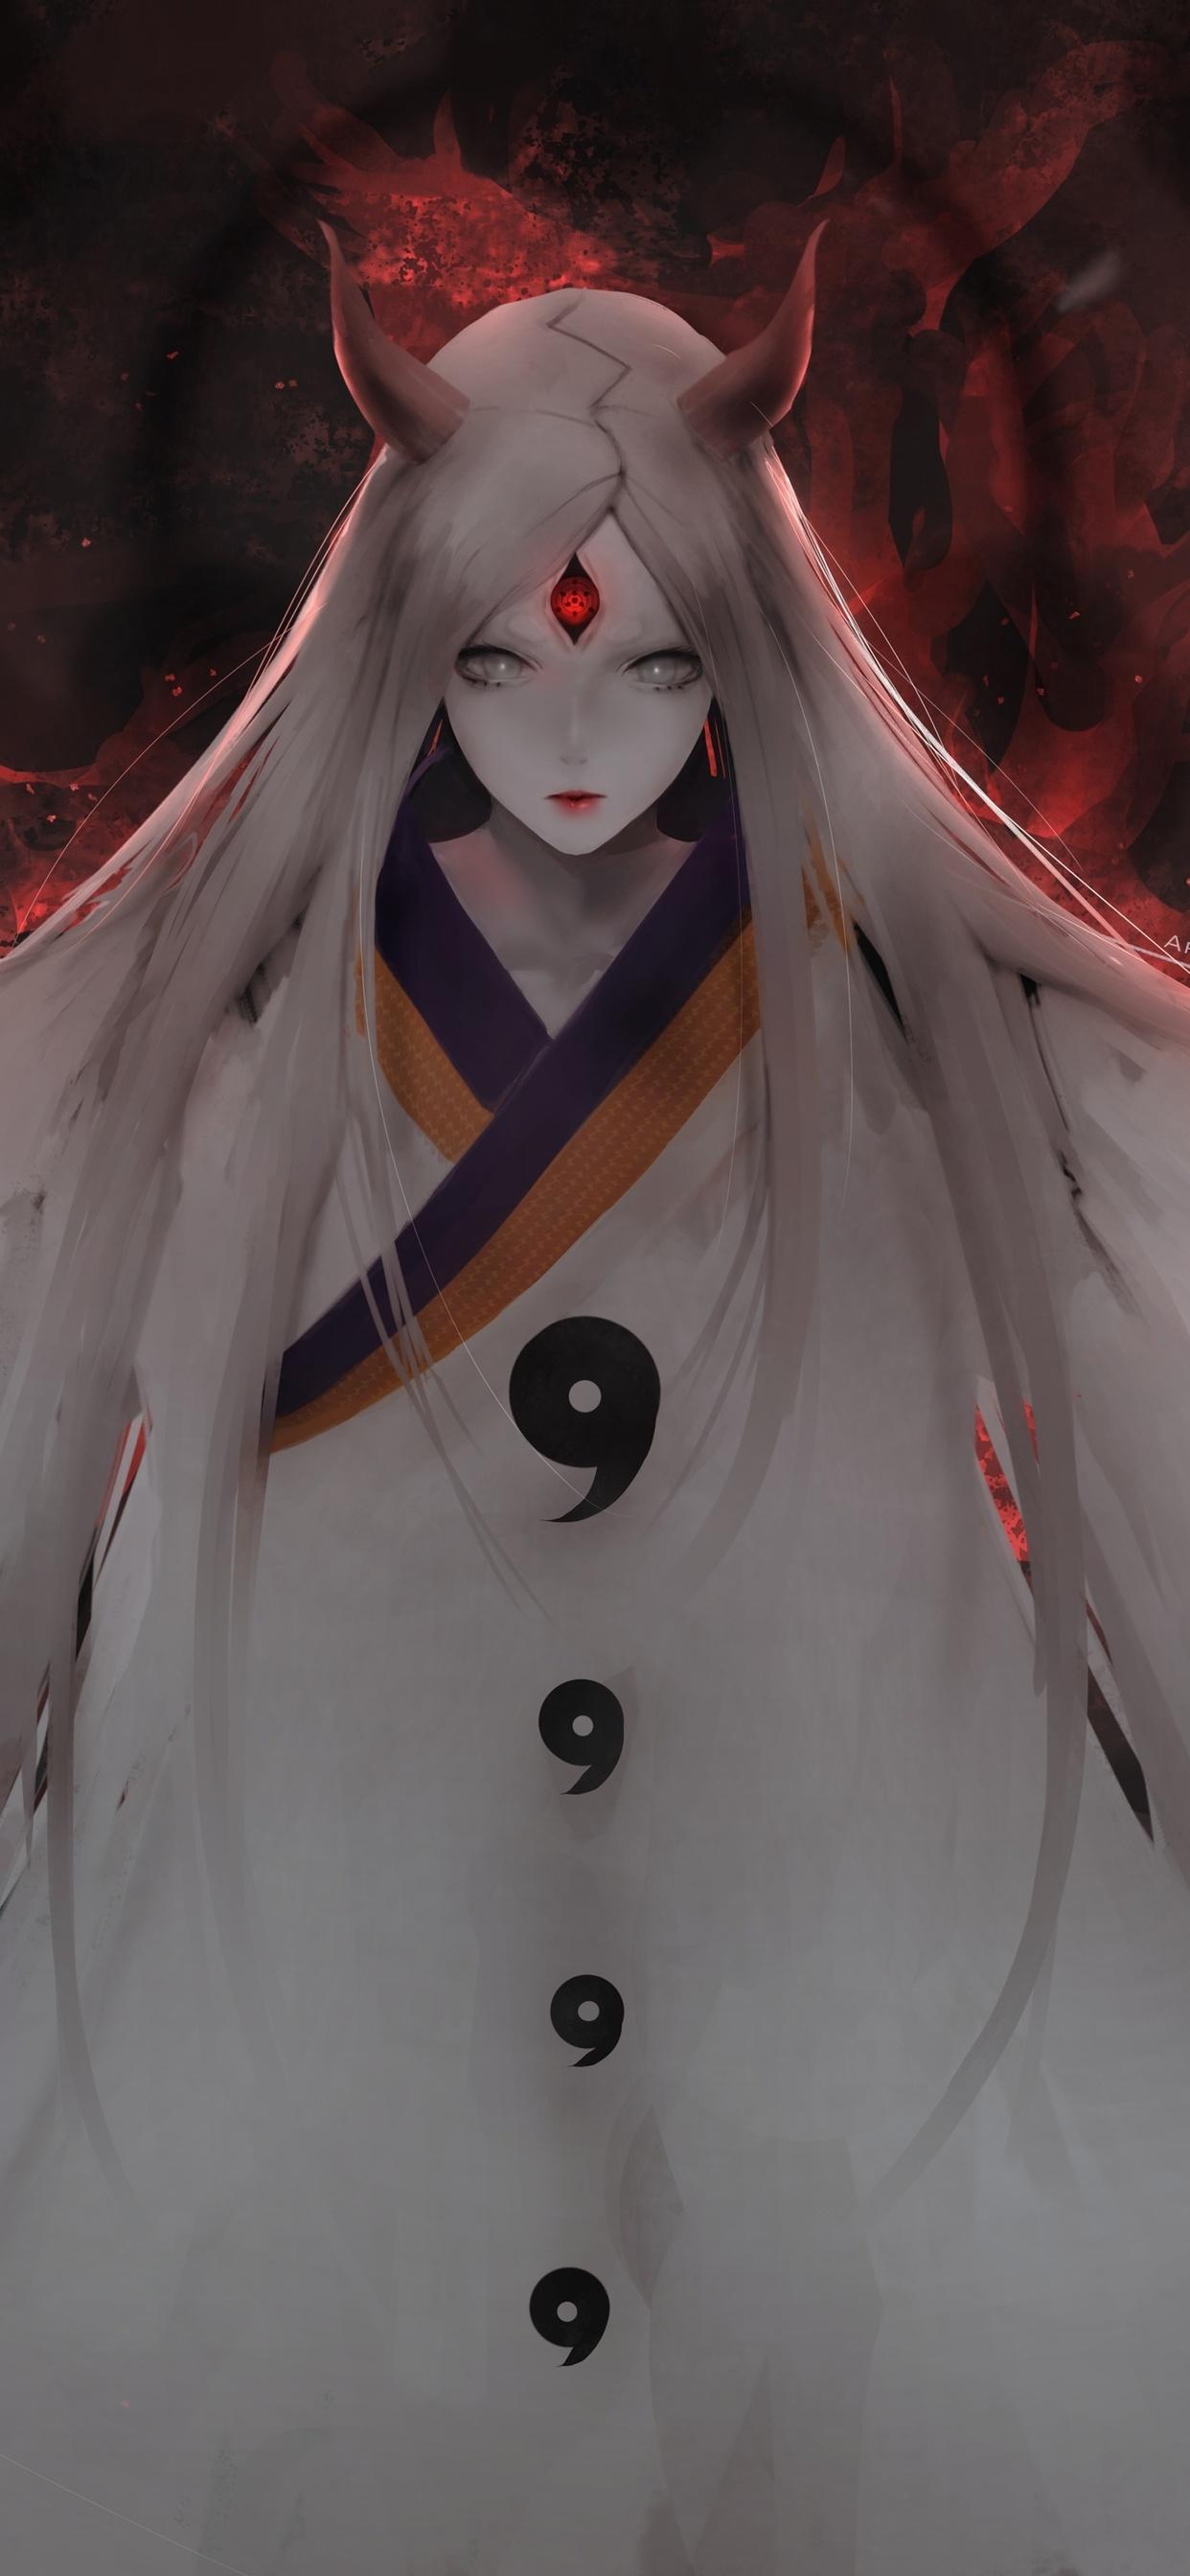 1242x2688 Anime Naruto Artwork 4k Iphone Xs Max Hd 4k